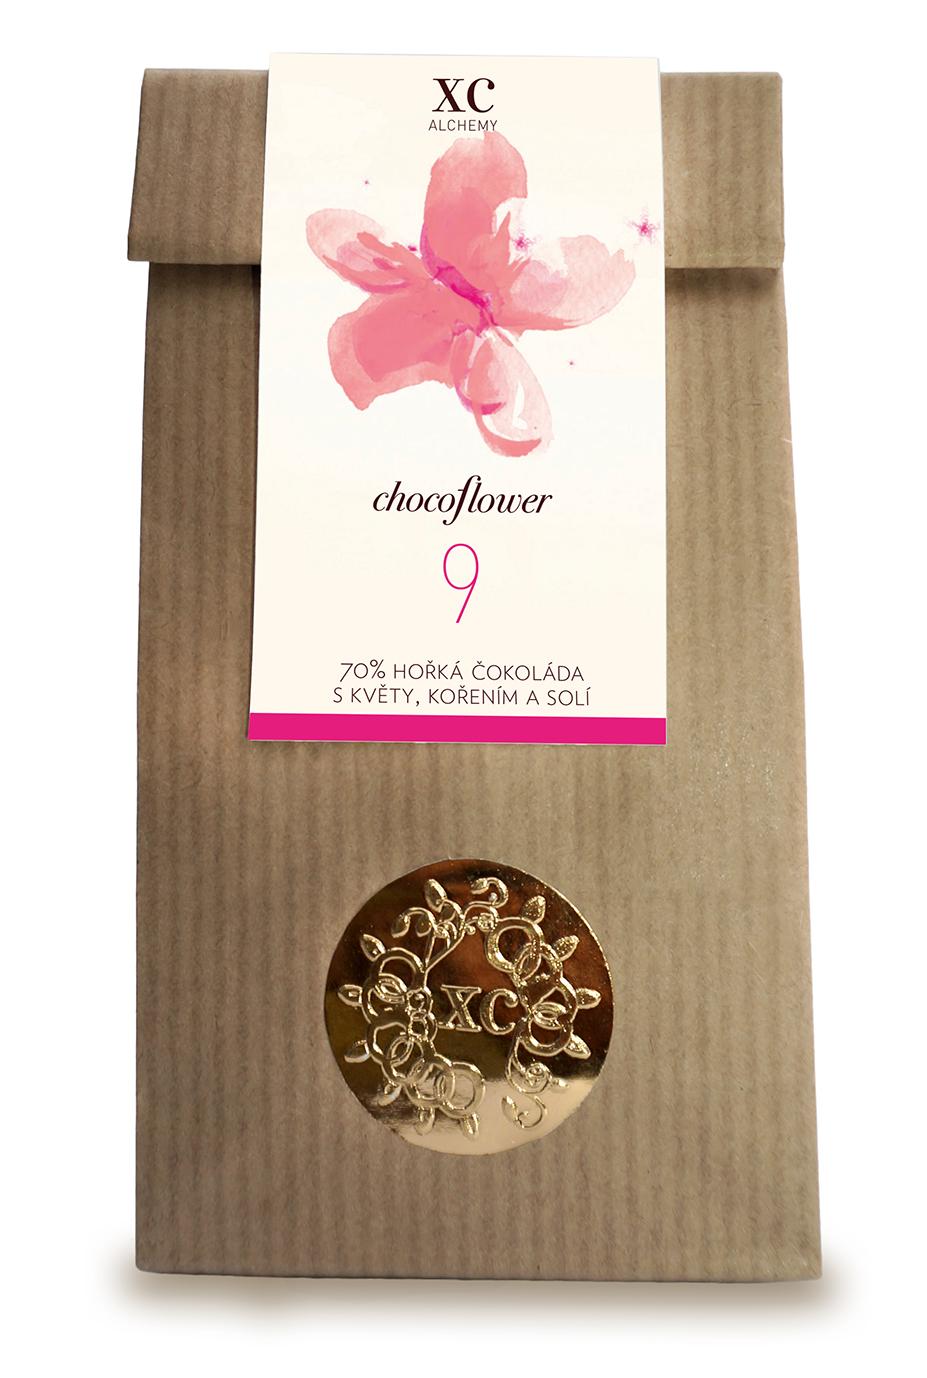 xc chocoflower 9 pink L